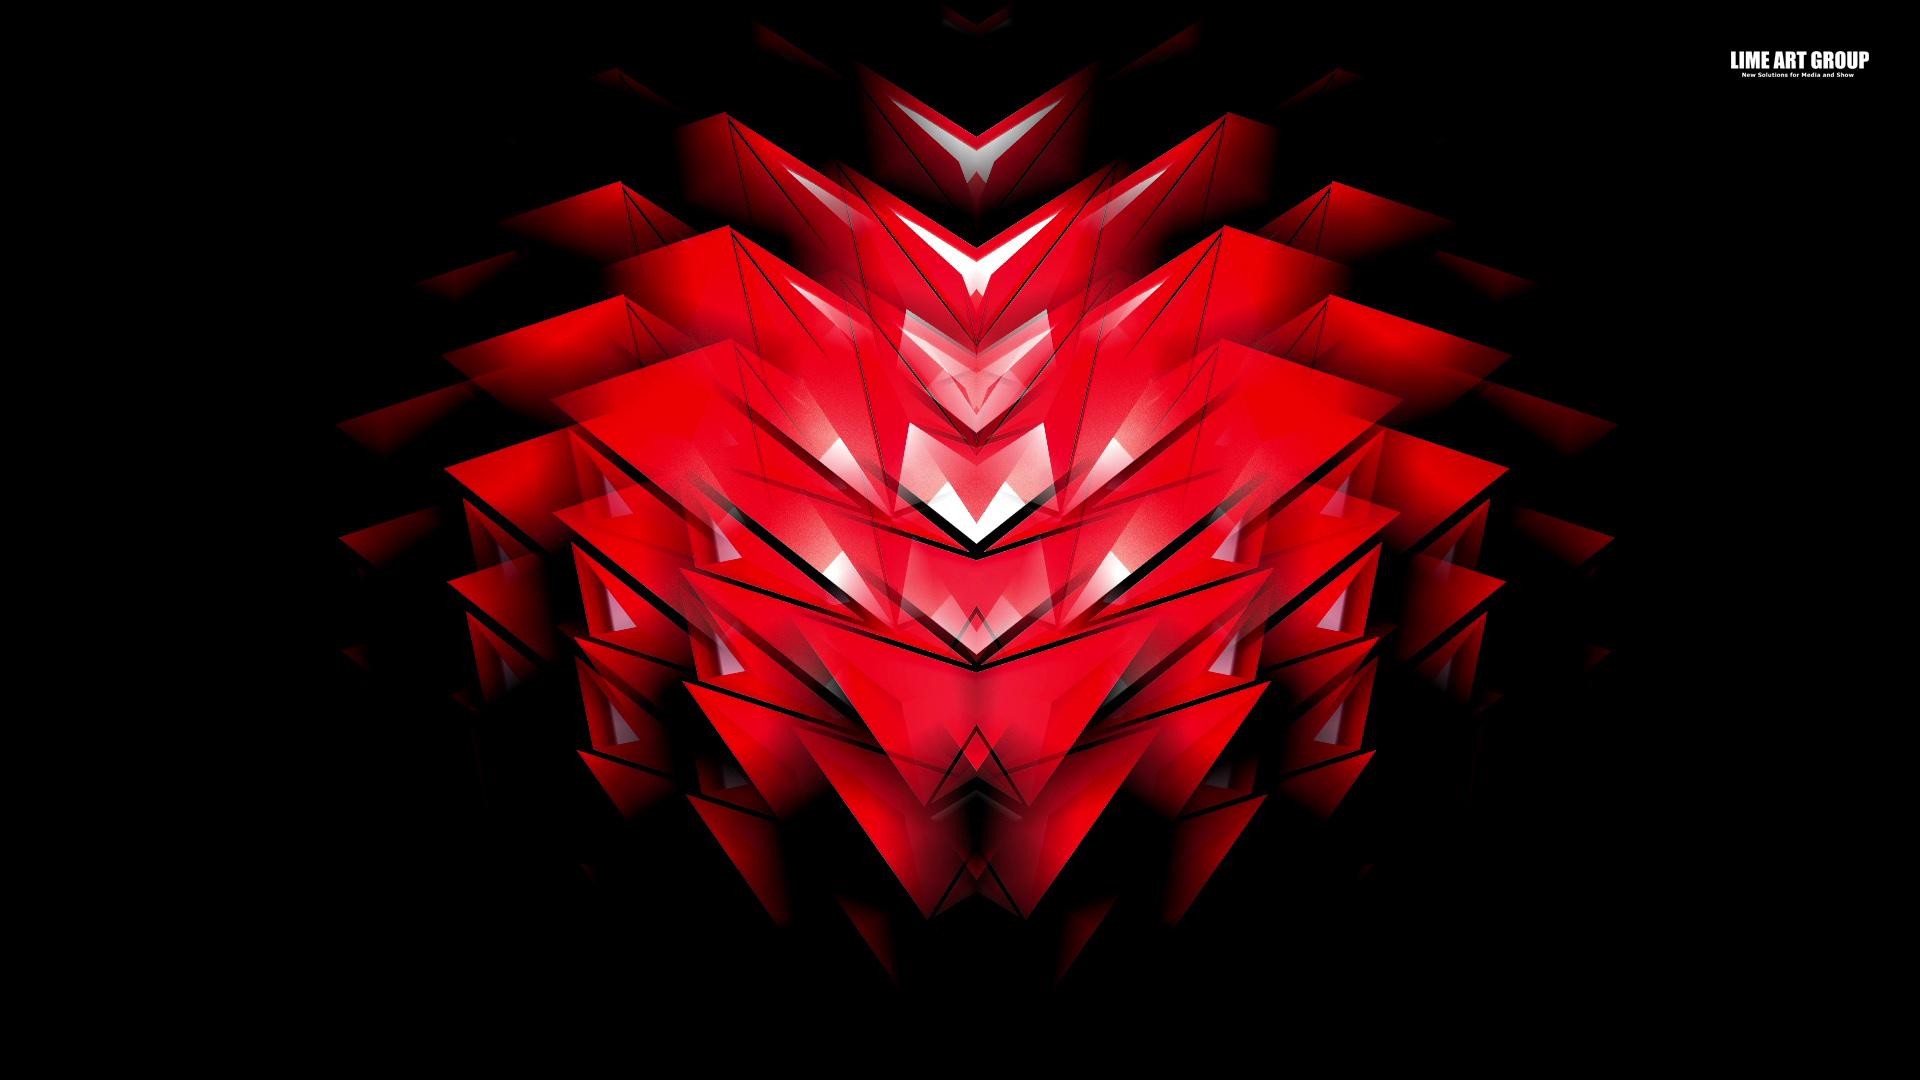 Heartbeat Wallpapers (3)